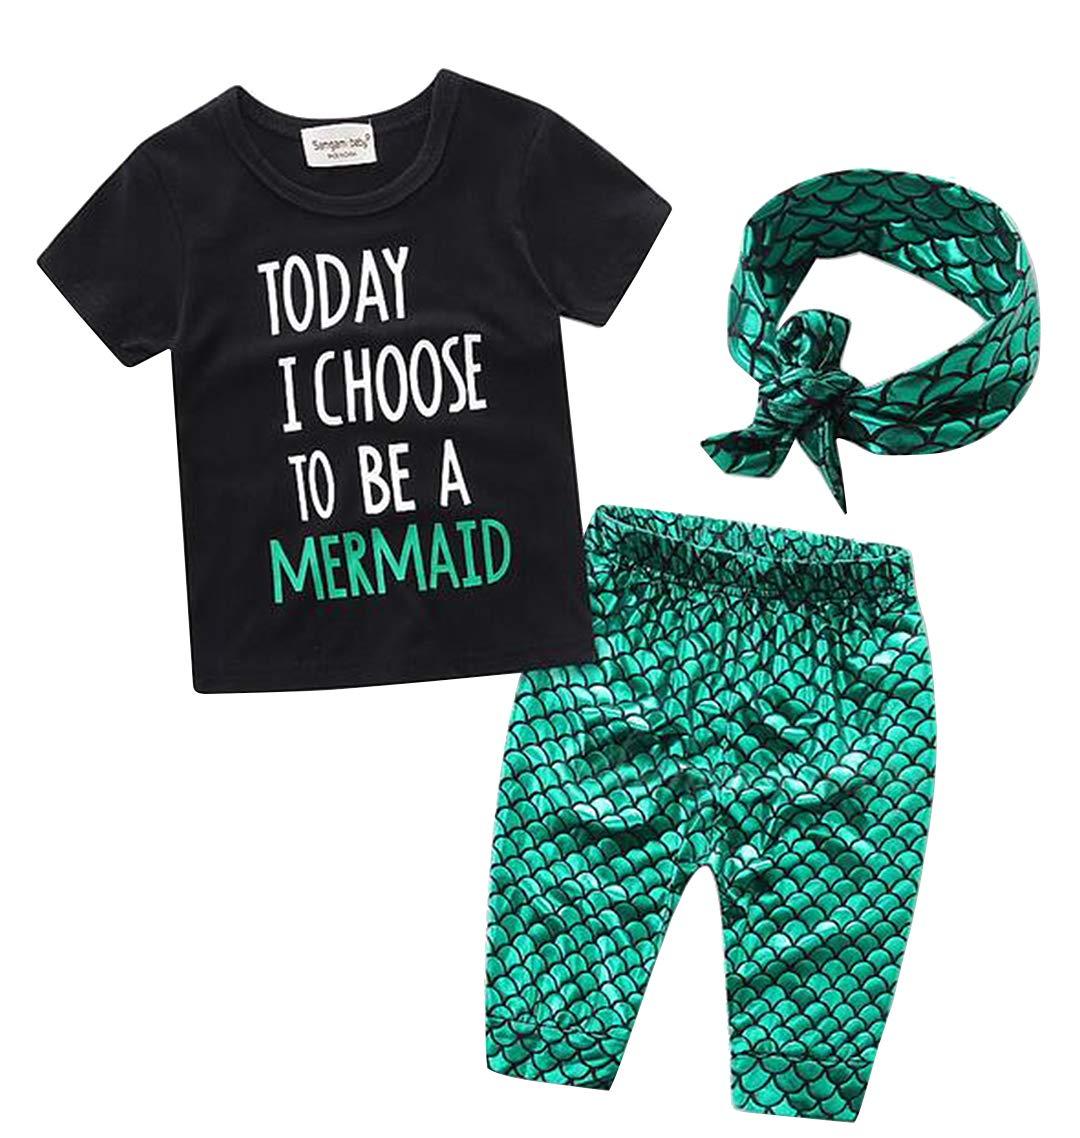 EGELEXY Kids Girls Summer Ruffle Shirts Sequin Mermaid Short Pant Outfits with Headband Size 12-24 Months (Green)